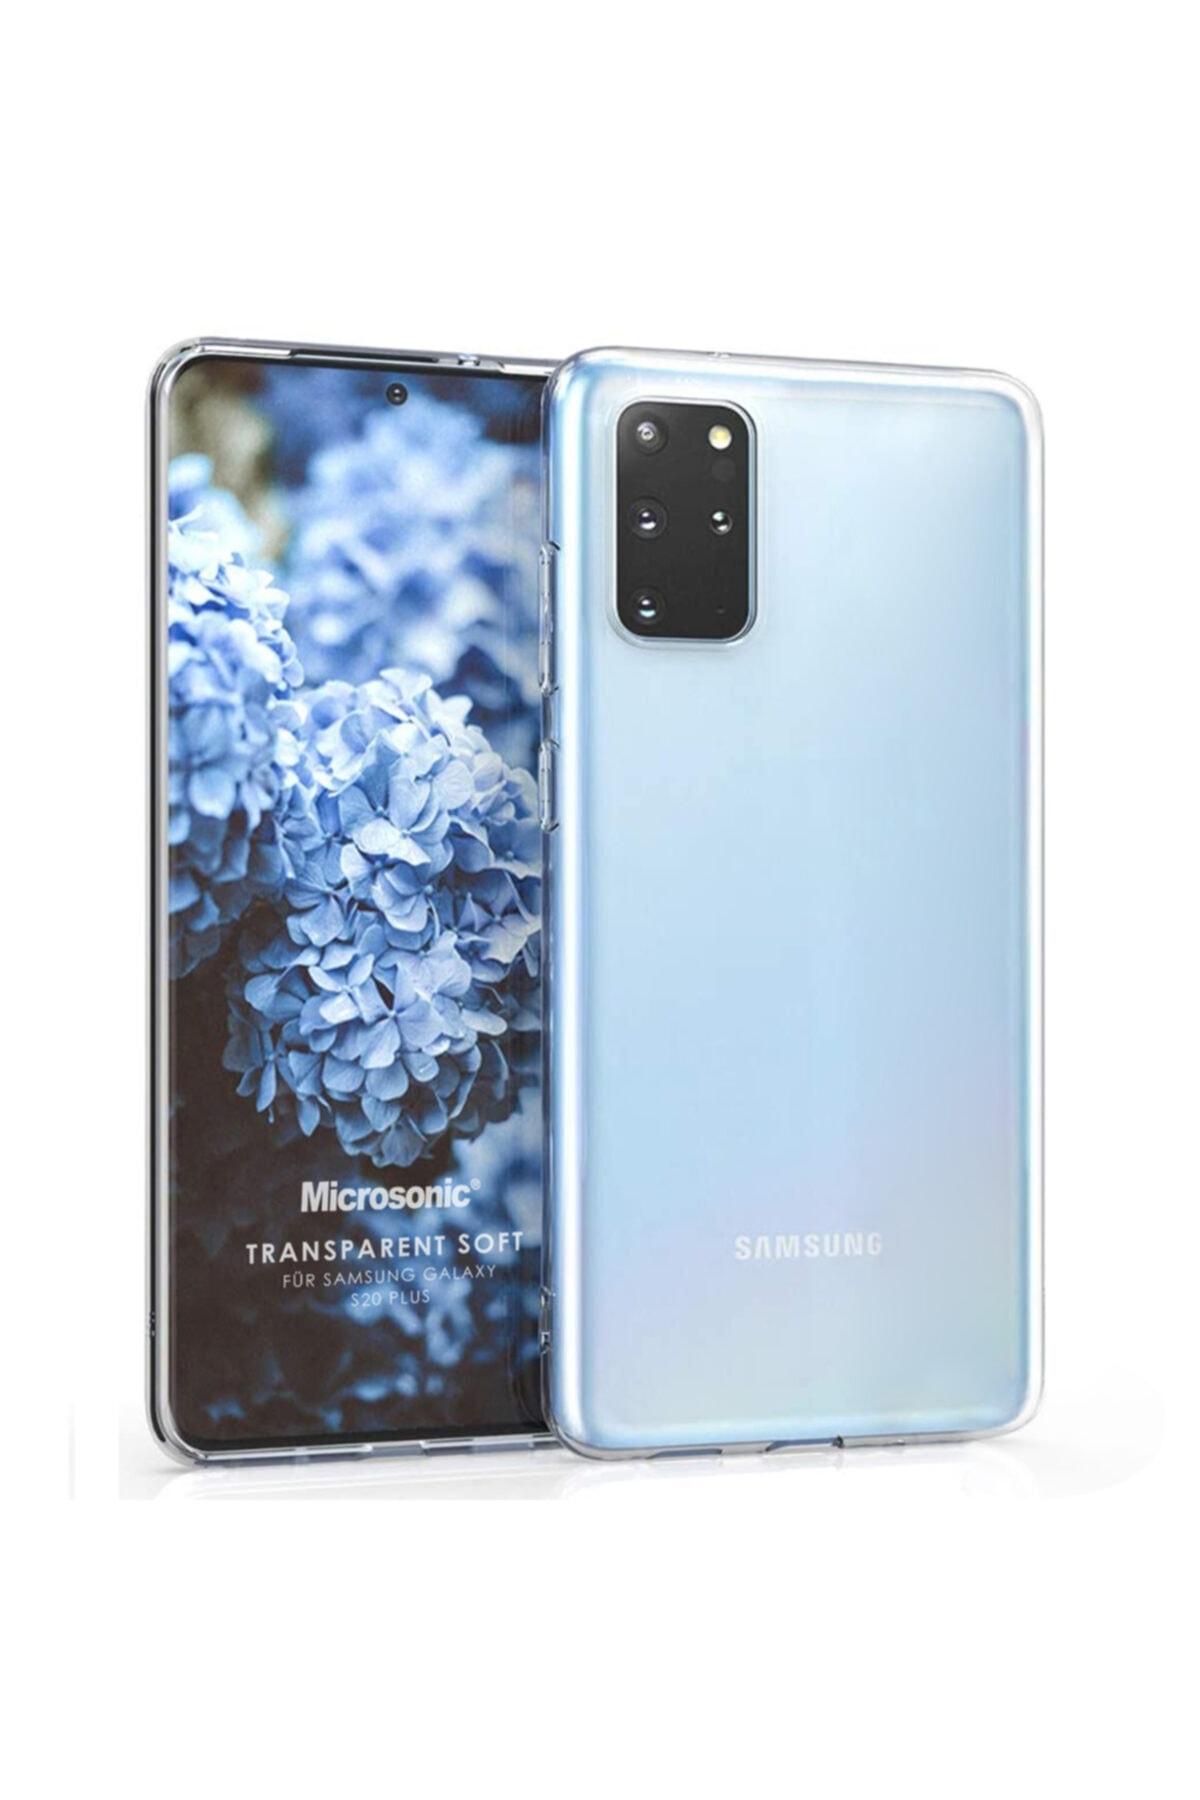 Microsonic Galaxy S20 Plus Kılıf Transparent Soft Beyaz